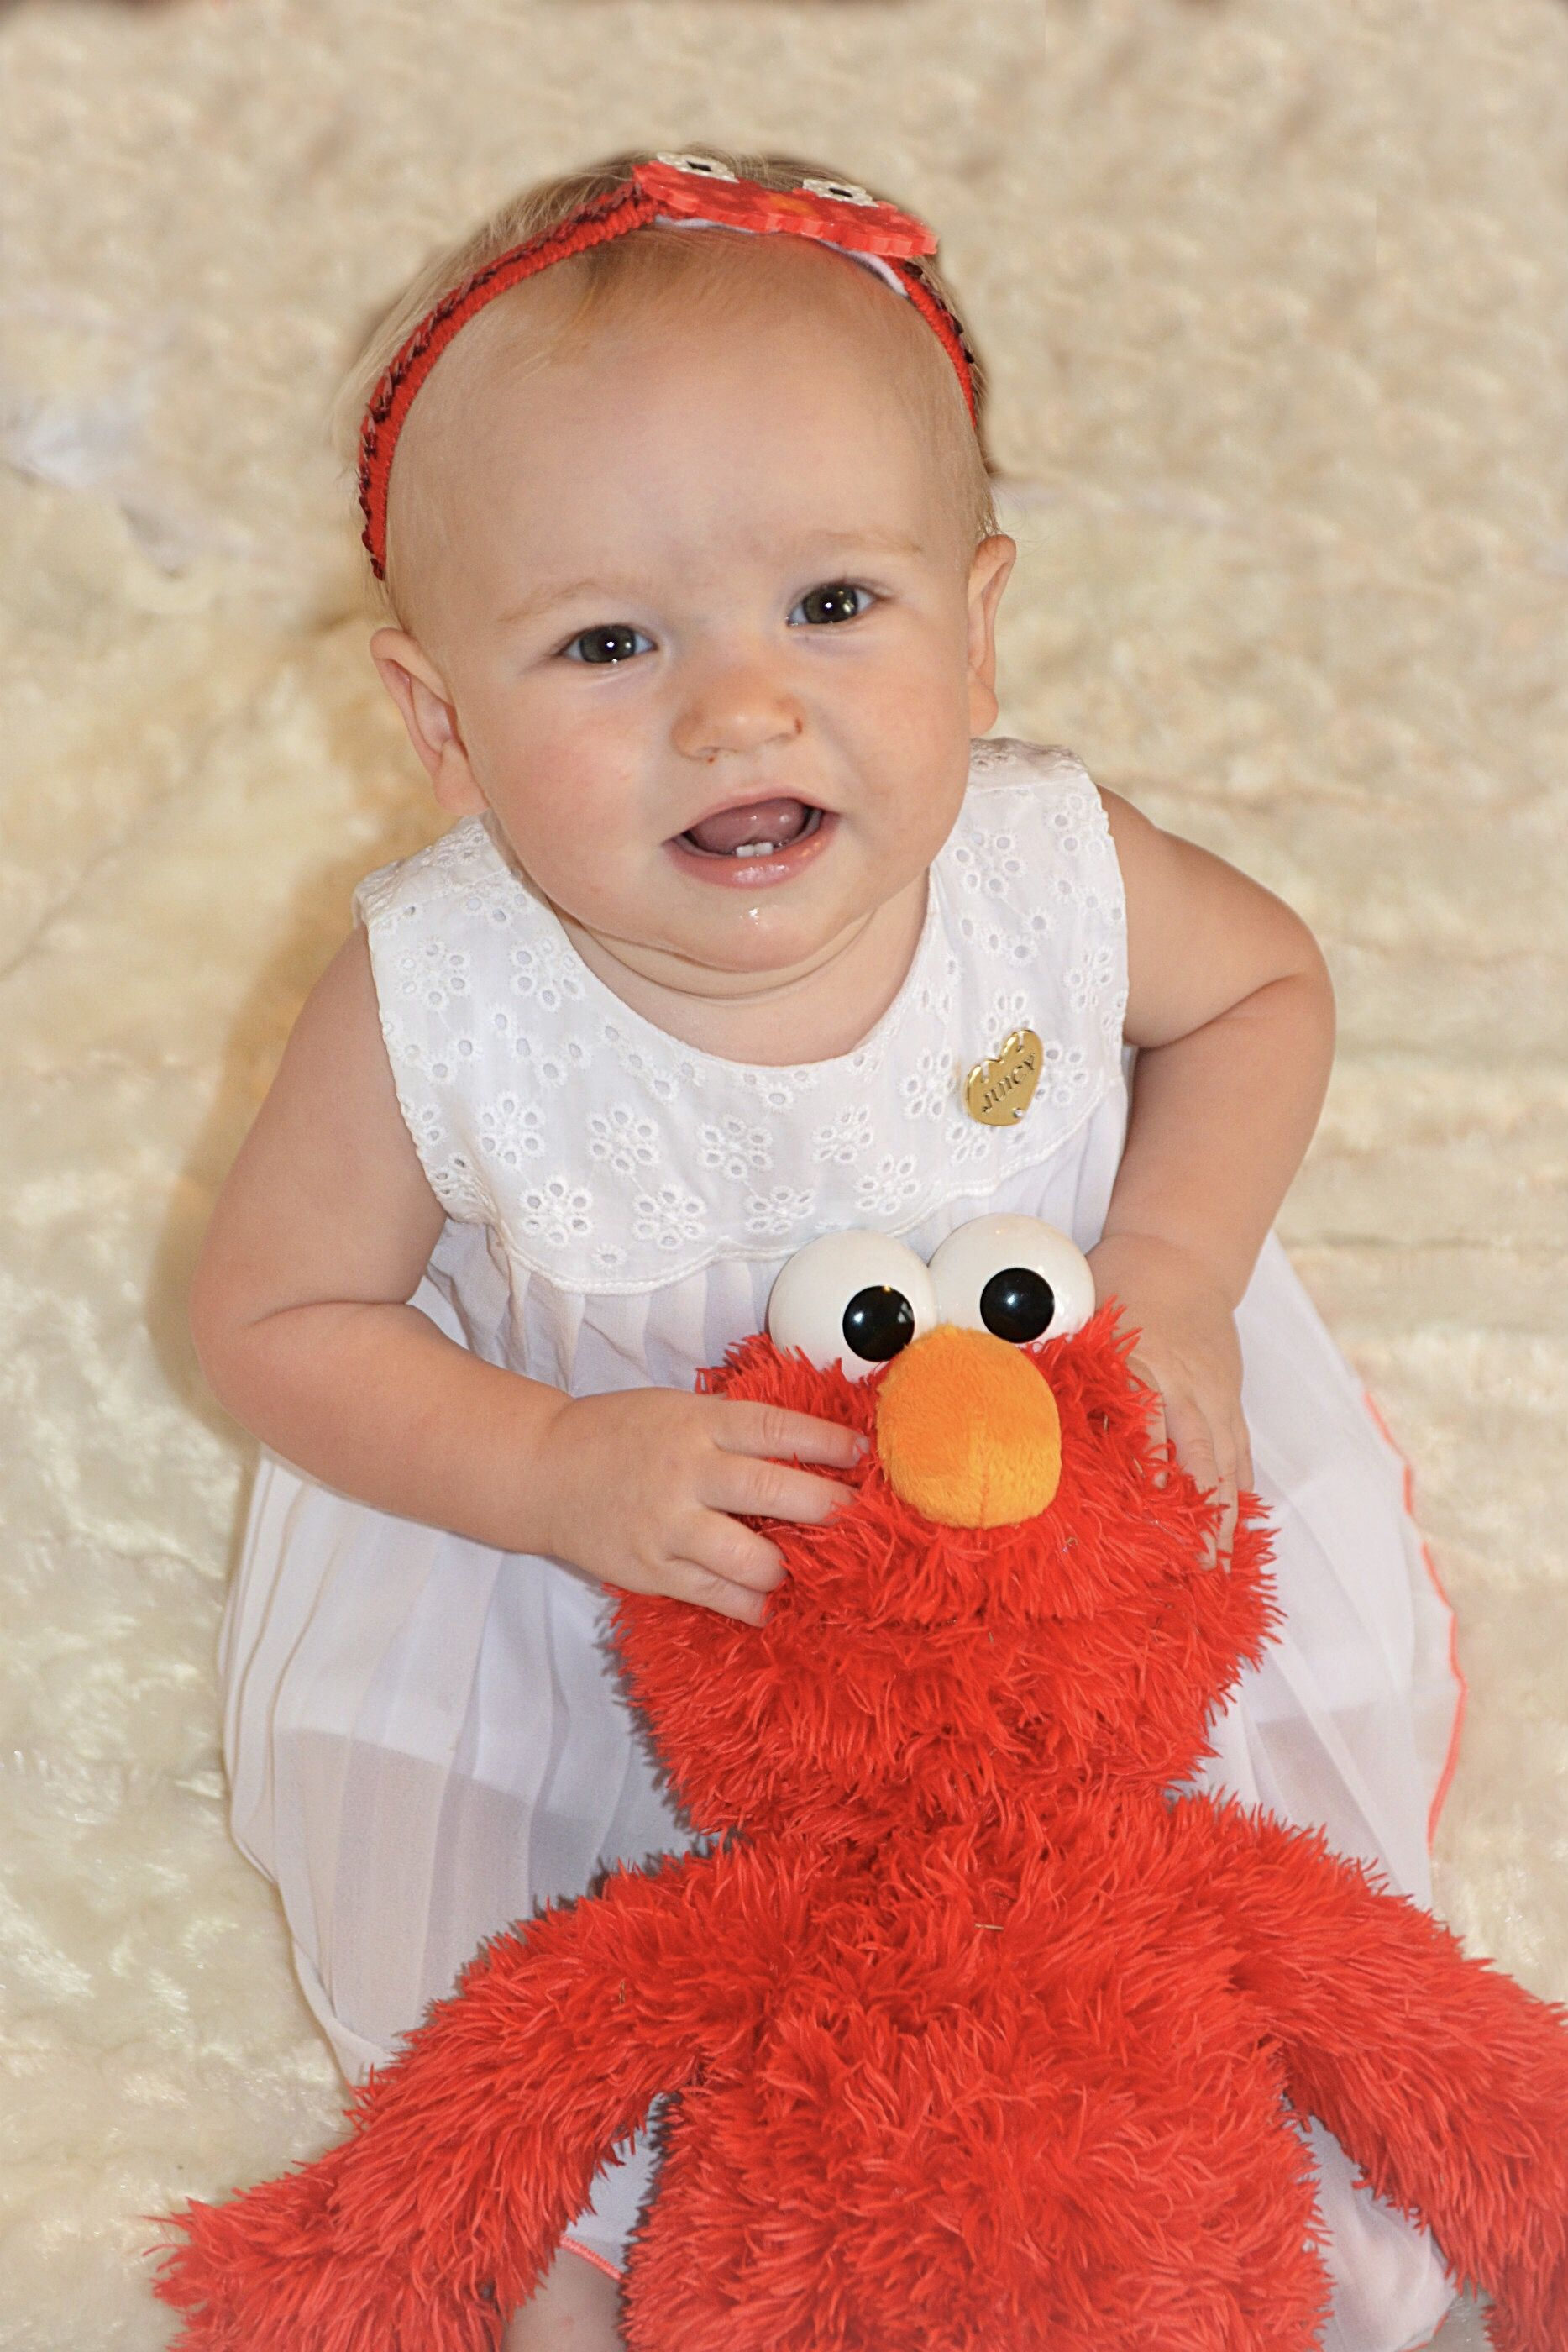 Elmo photo shoot 11 month old photoshoot katelyn murphy photography elmo photoshoot 11monthold